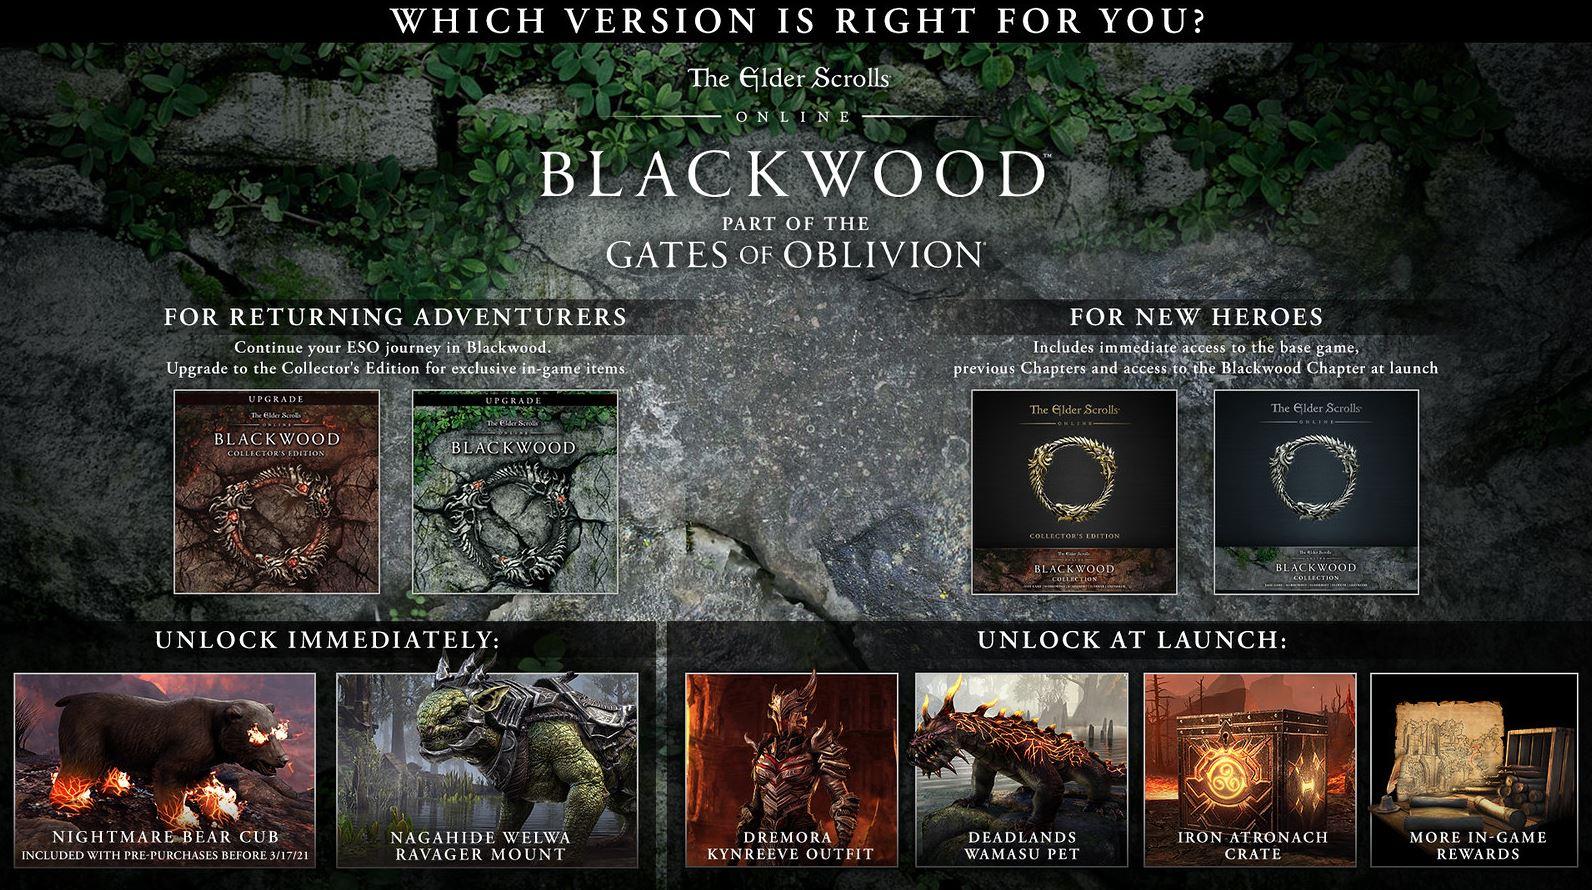 the-elder-scrolls-online-year-long-gates-of-oblivion-narrative-detailed-with-major-blackwood-expansion-releasing-june-8-on-ps4